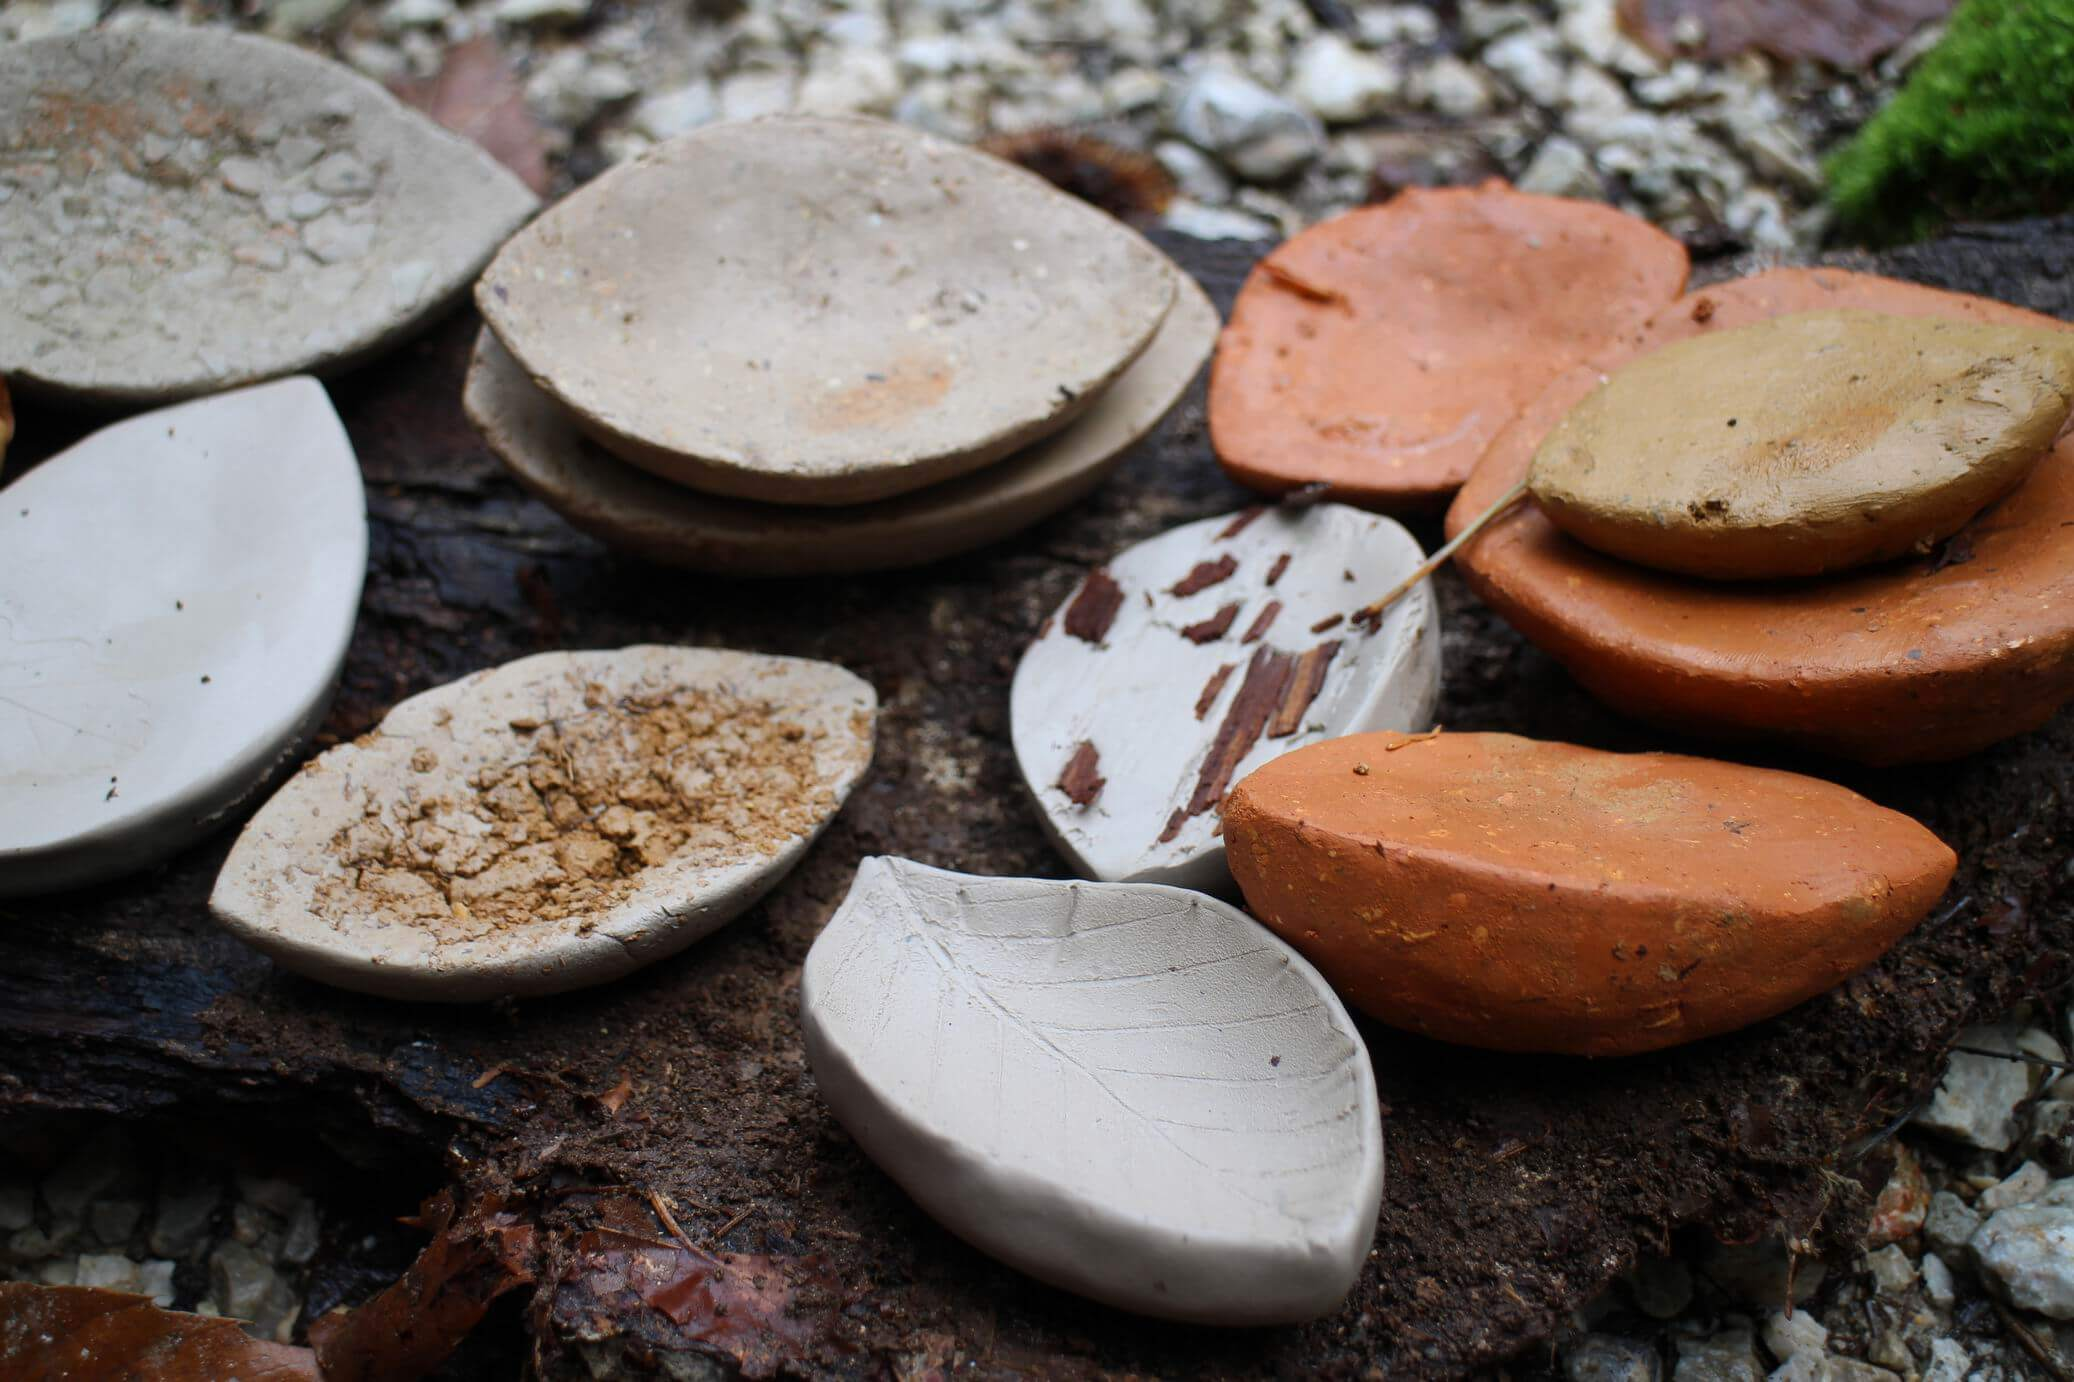 ceramics-and-nature-course-cerdeira23.JPG